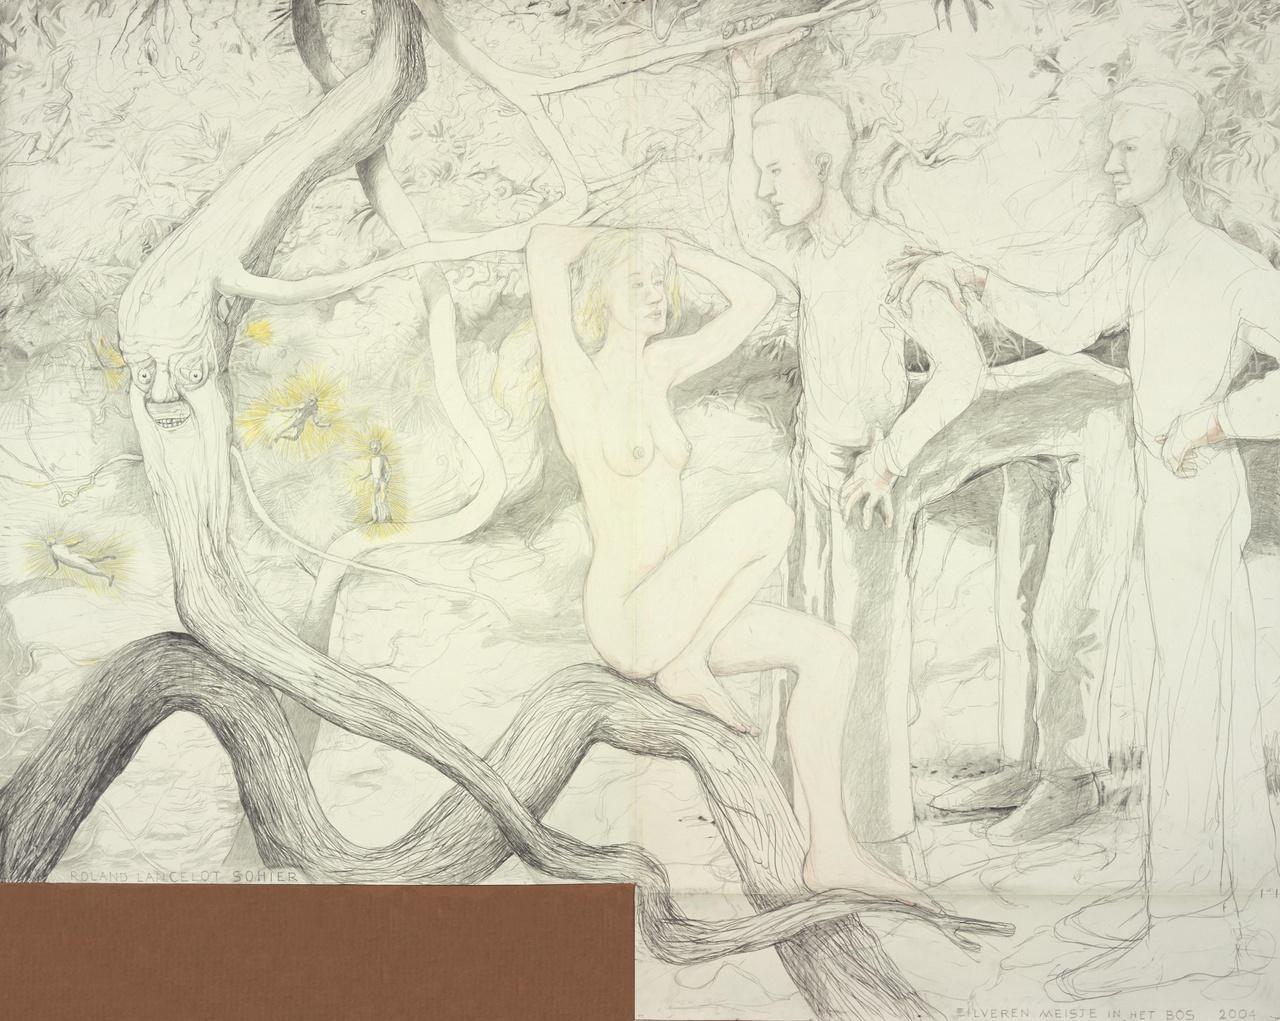 Zilveren meisje in het bos